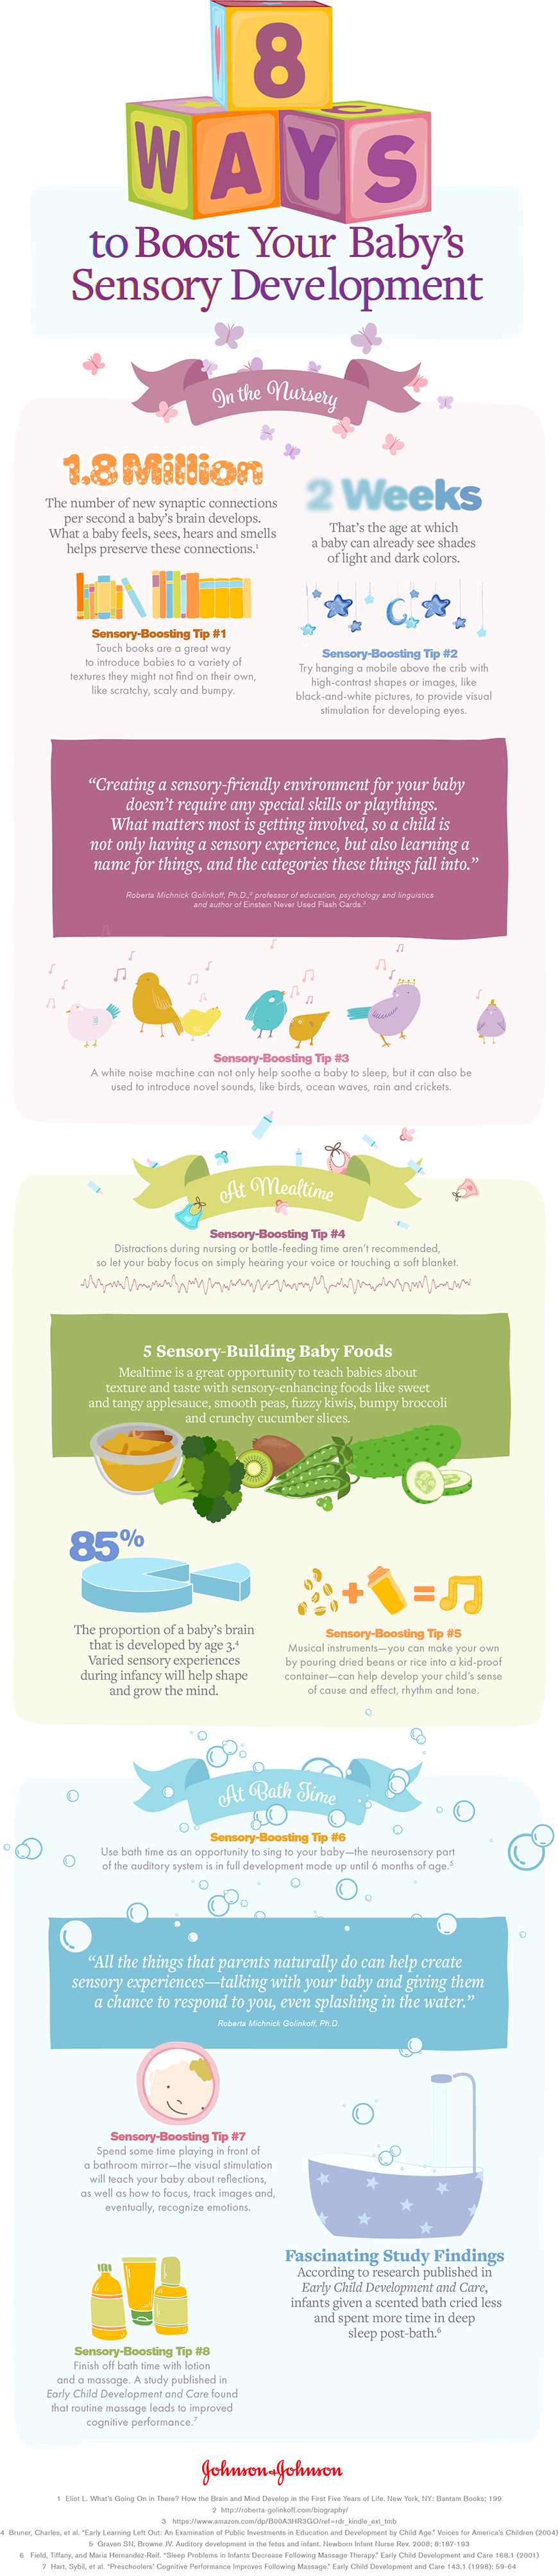 8 Ways to Boost Your Baby's Sensory Development